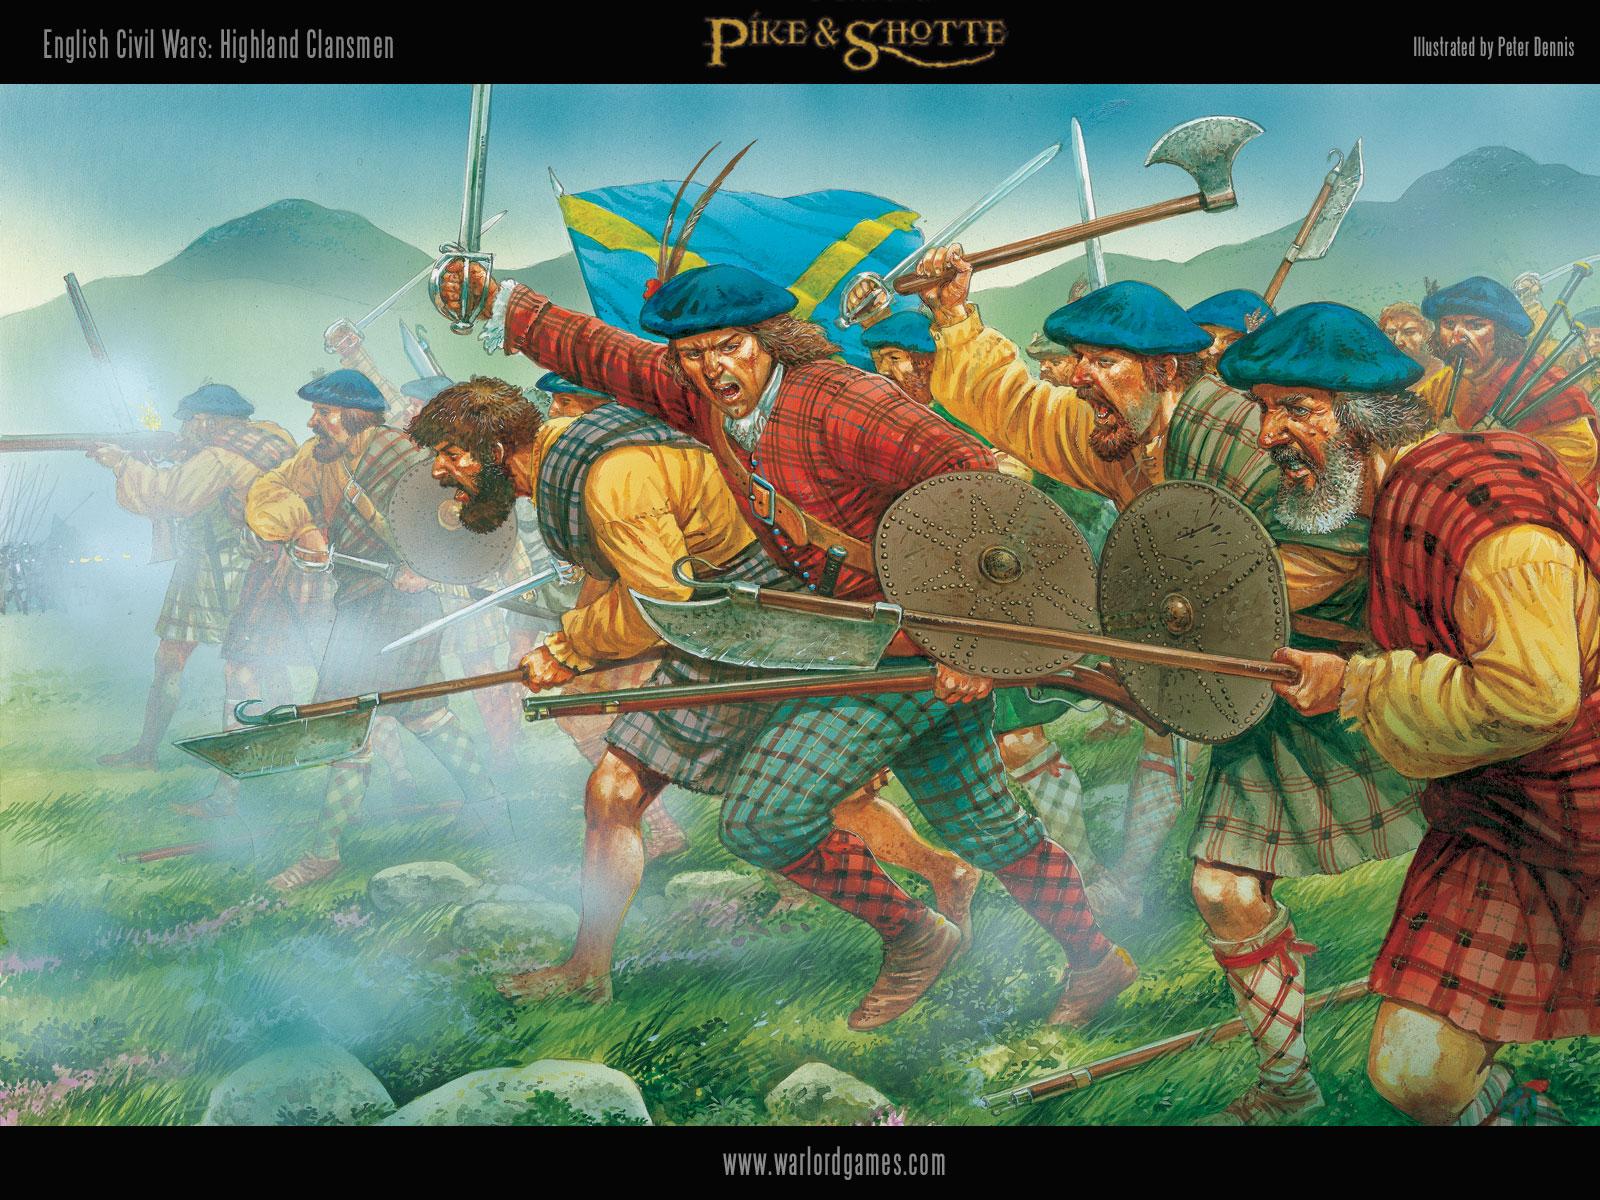 Illustrations P&S Highland-Clansmen-wallpaper